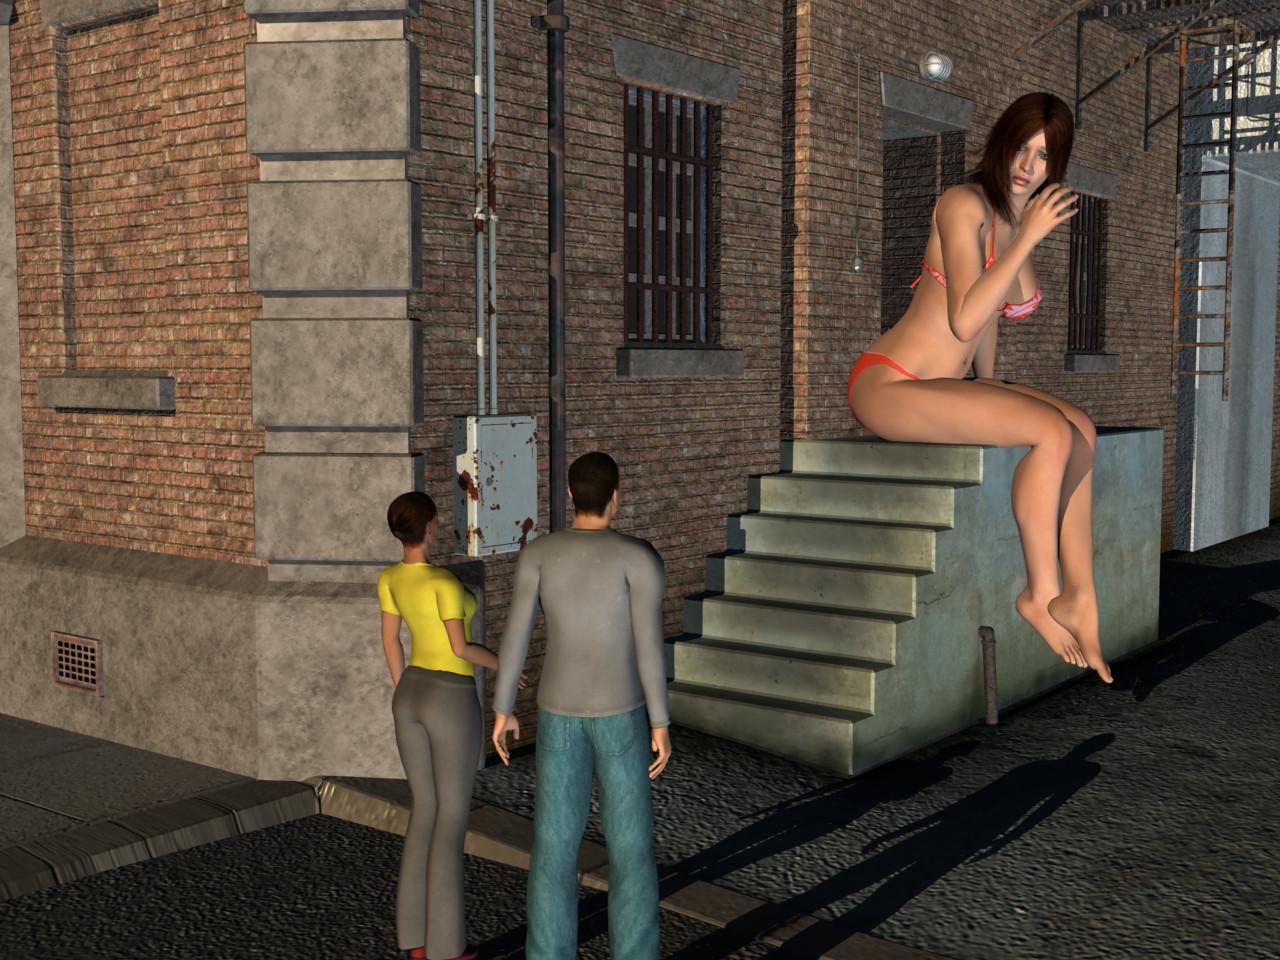 3d giant uses tiny woman hentay movie